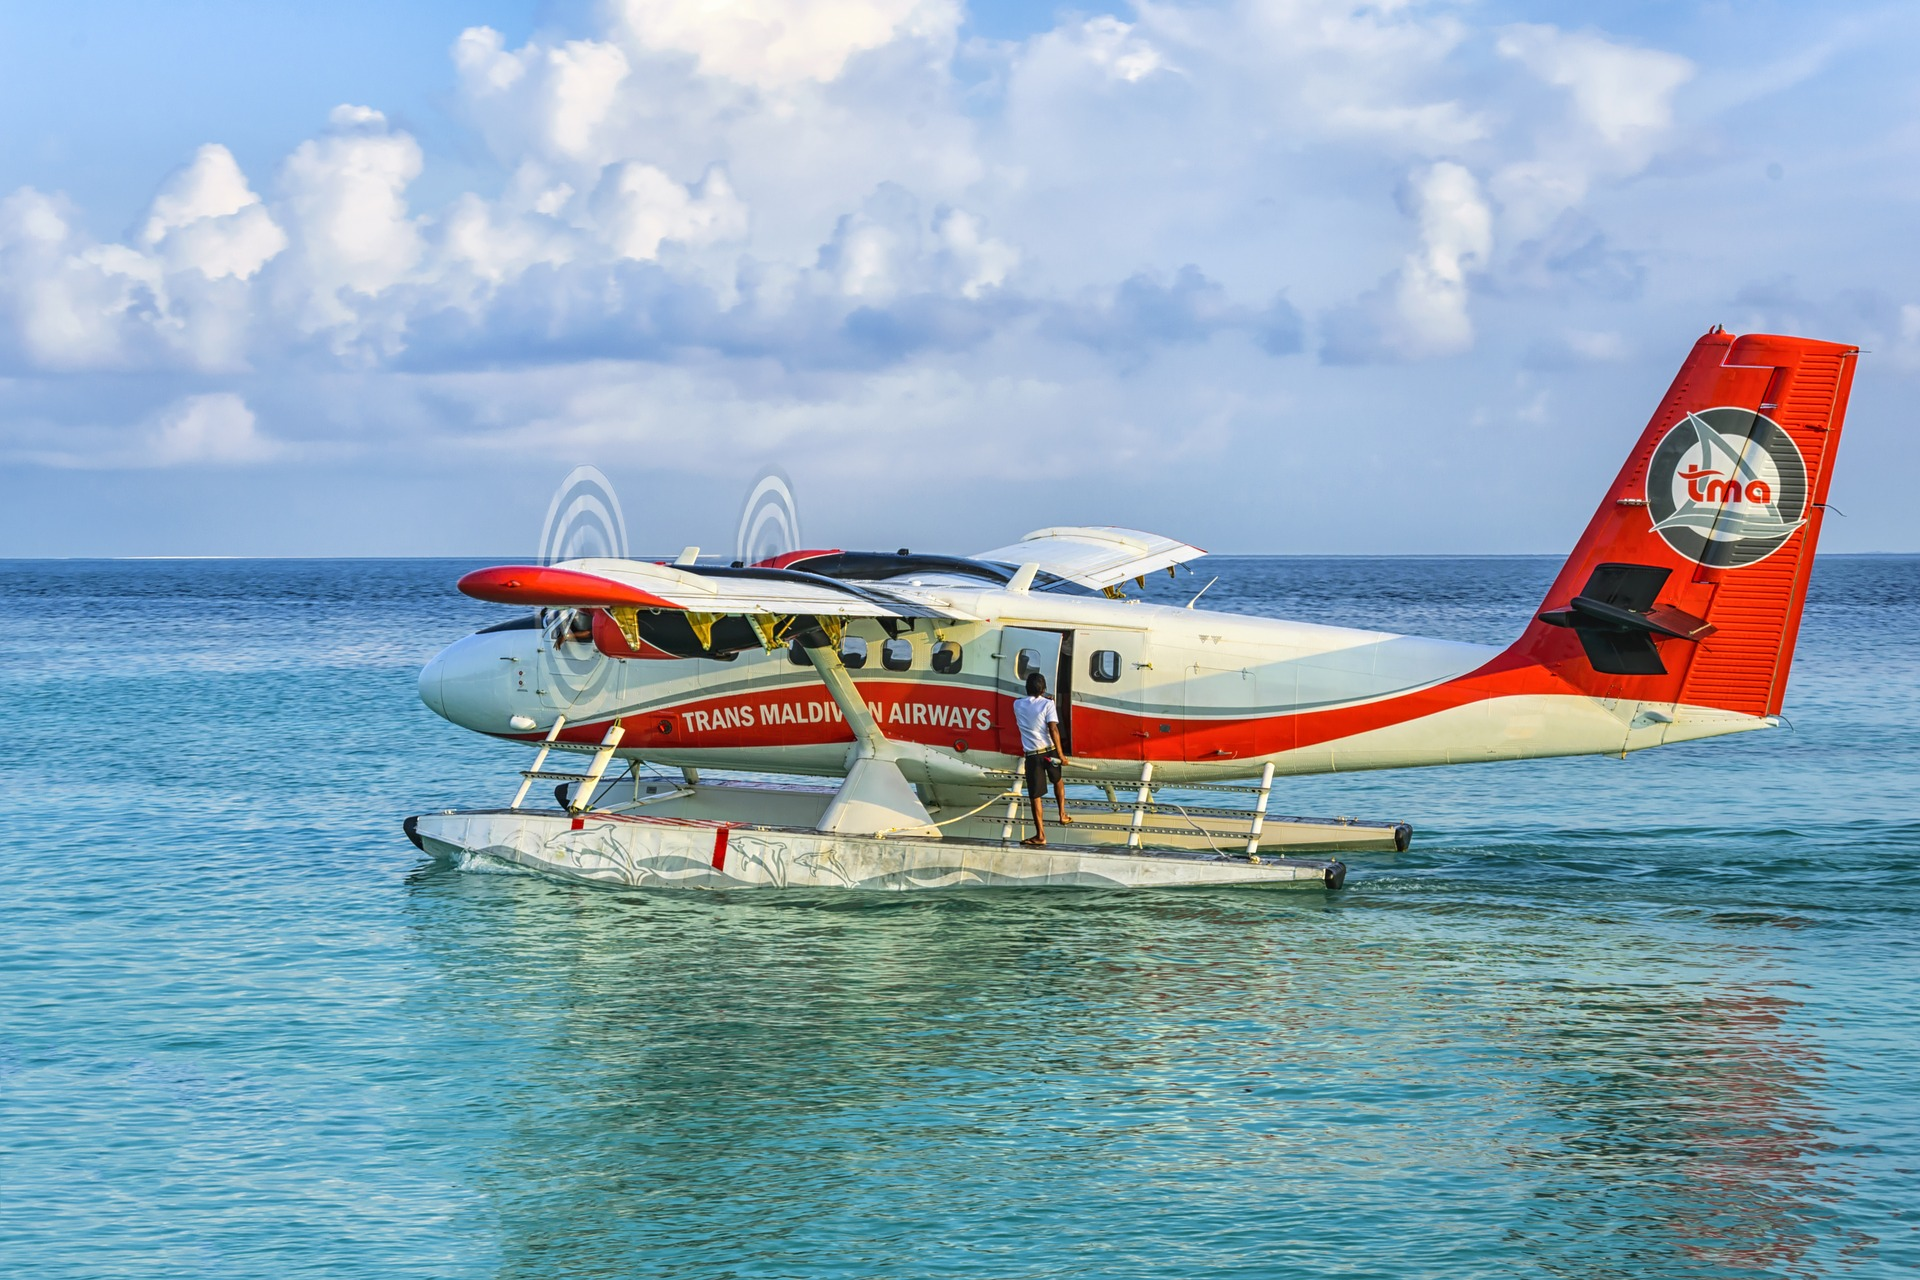 Airplane near the Maldives